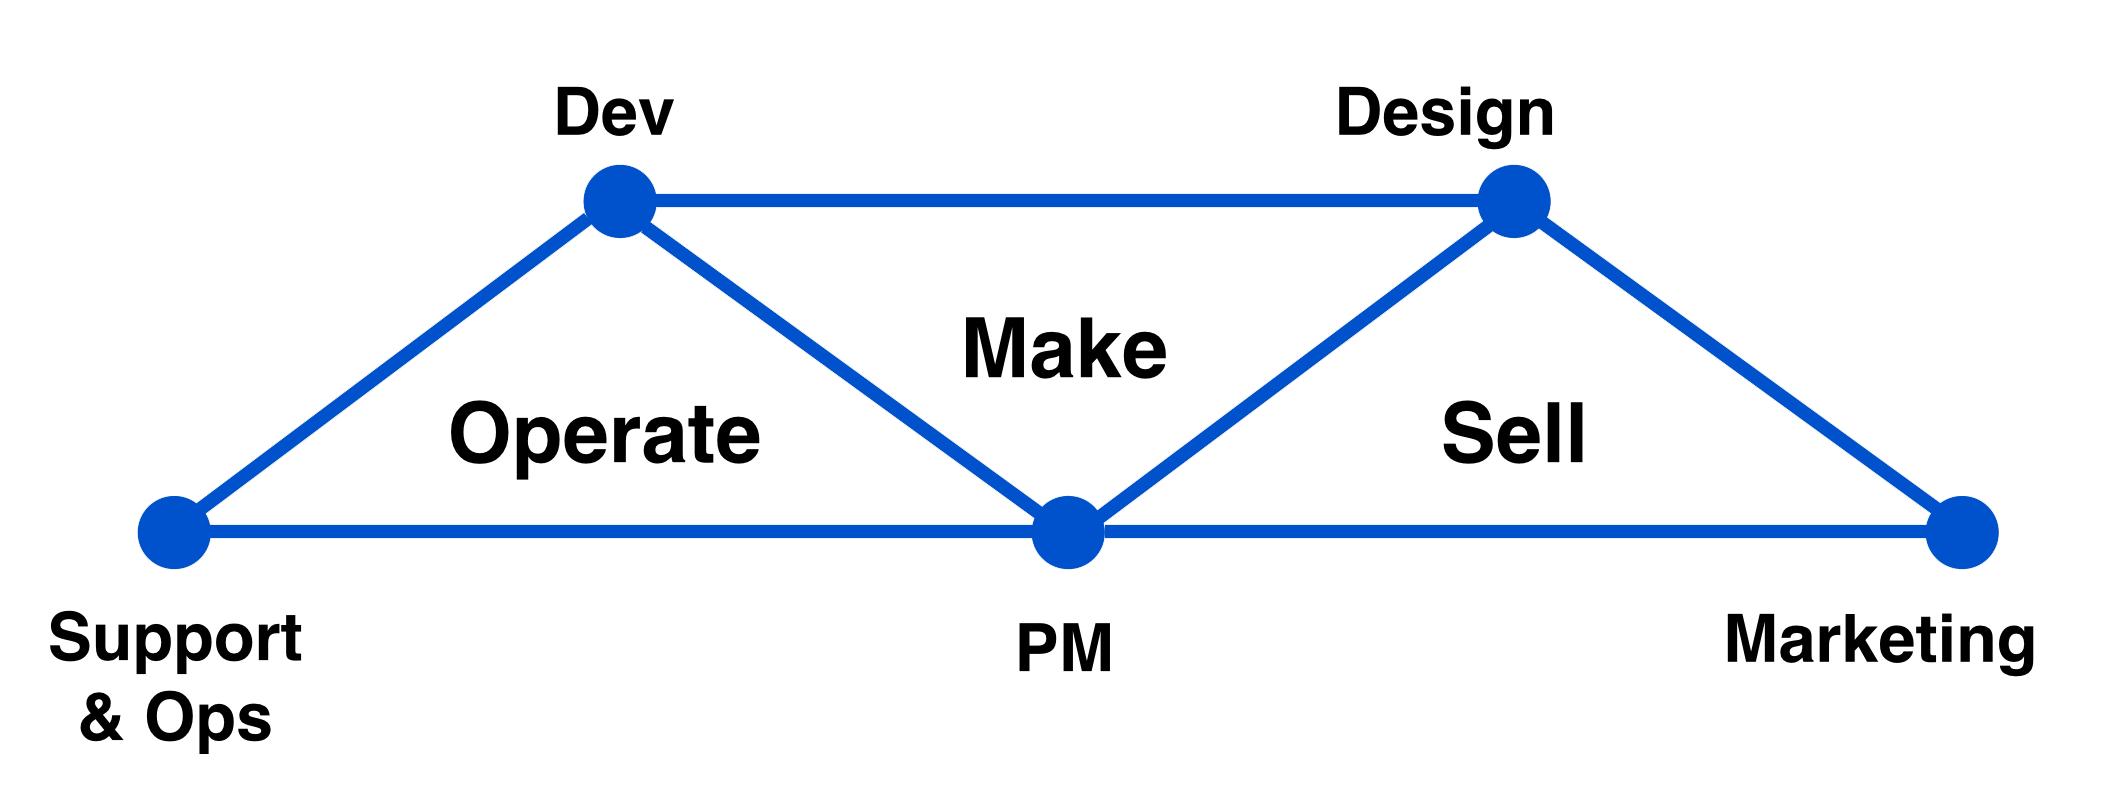 Triadi dei team di Atlassian   Agile Coach Atlassian